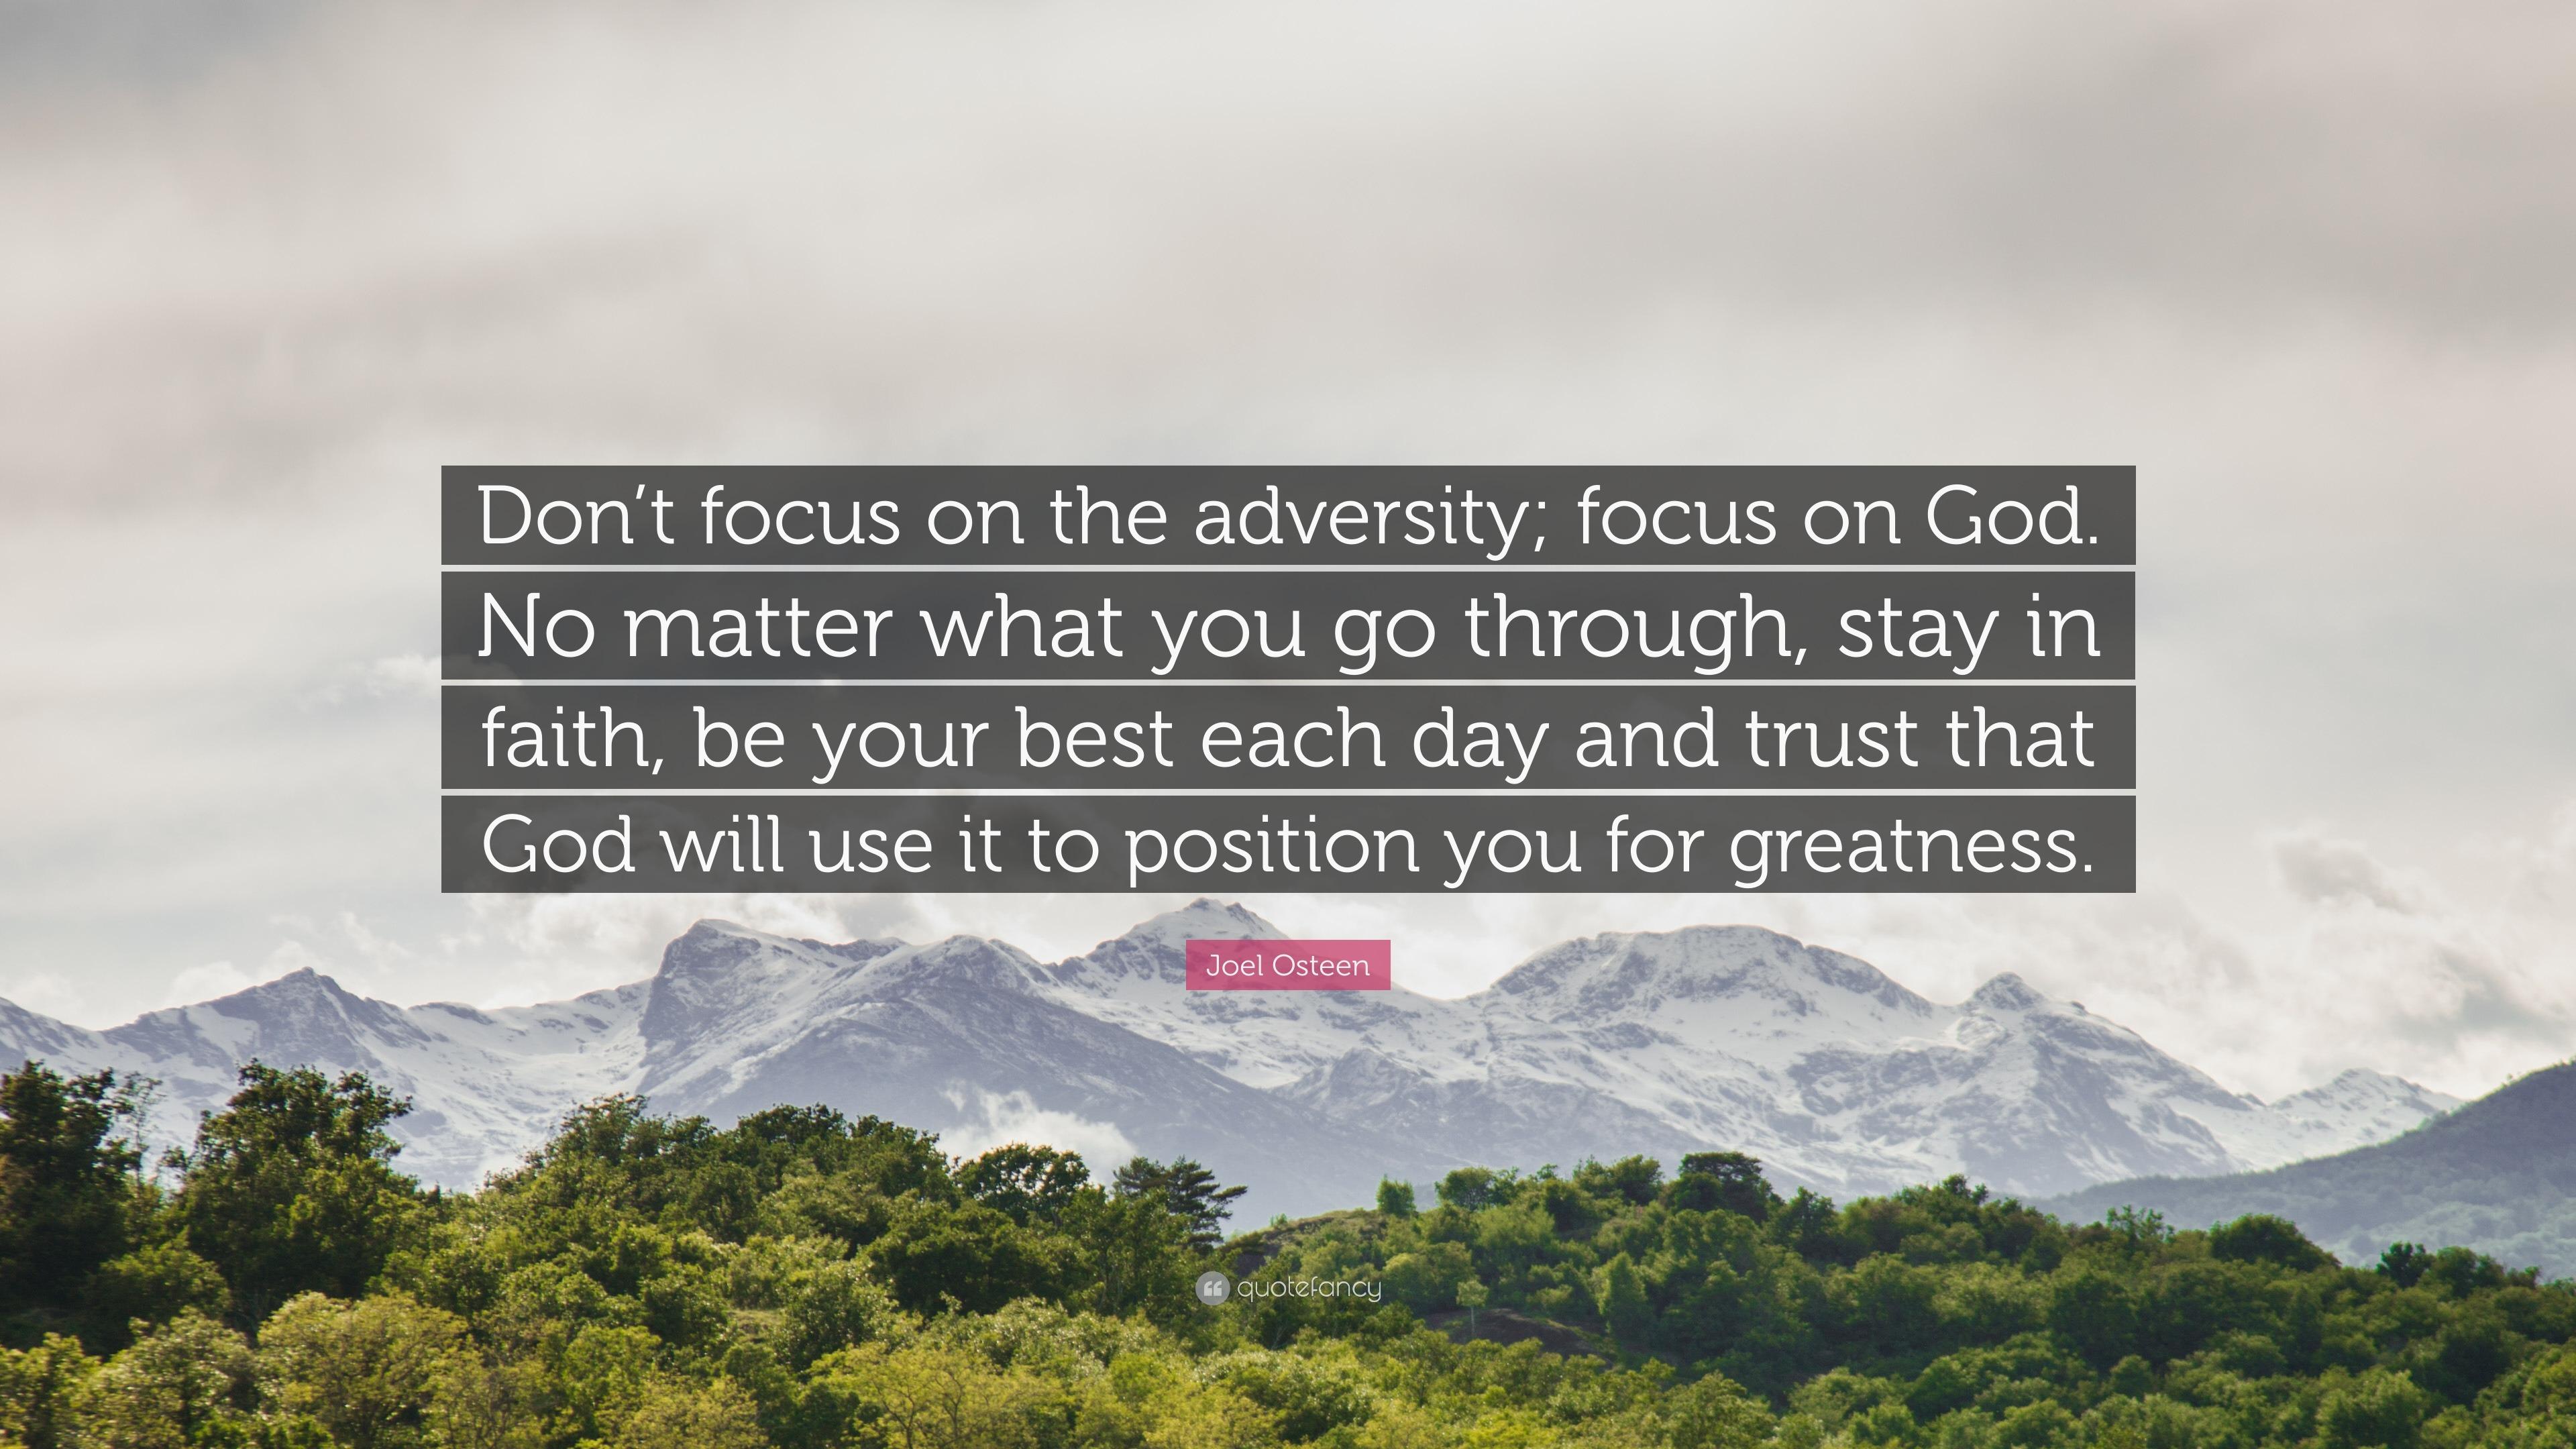 Superieur Joel Osteen Quote: U201cDonu0027t Focus On The Adversity; Focus On God